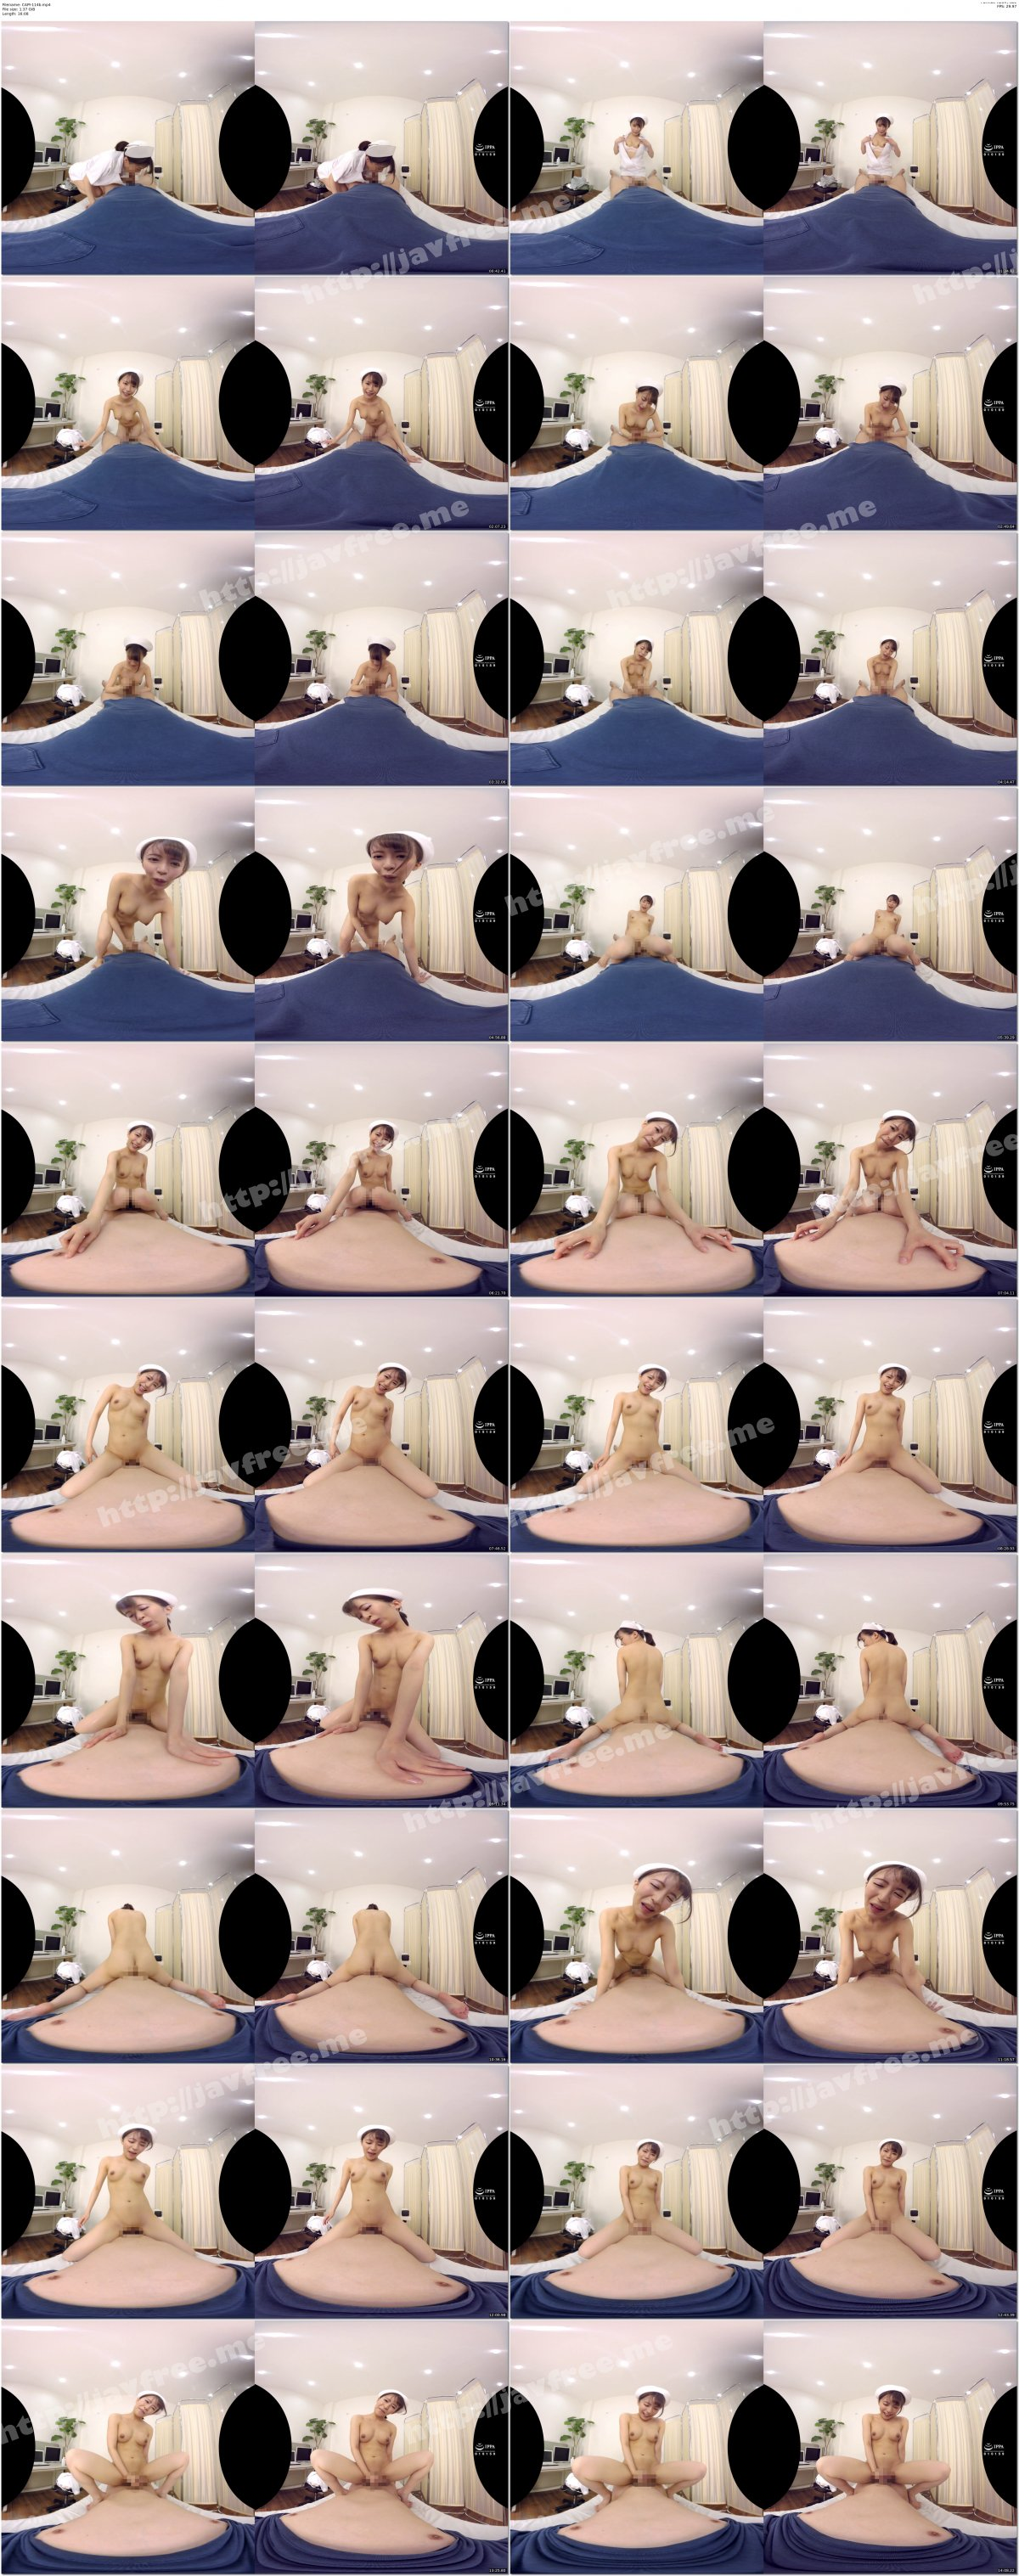 [CAPI-114] 【VR】ドクター不在をいいことに患者を誘惑診断する淫乱ナース 望月りさ - image CAPI-114b on https://javfree.me